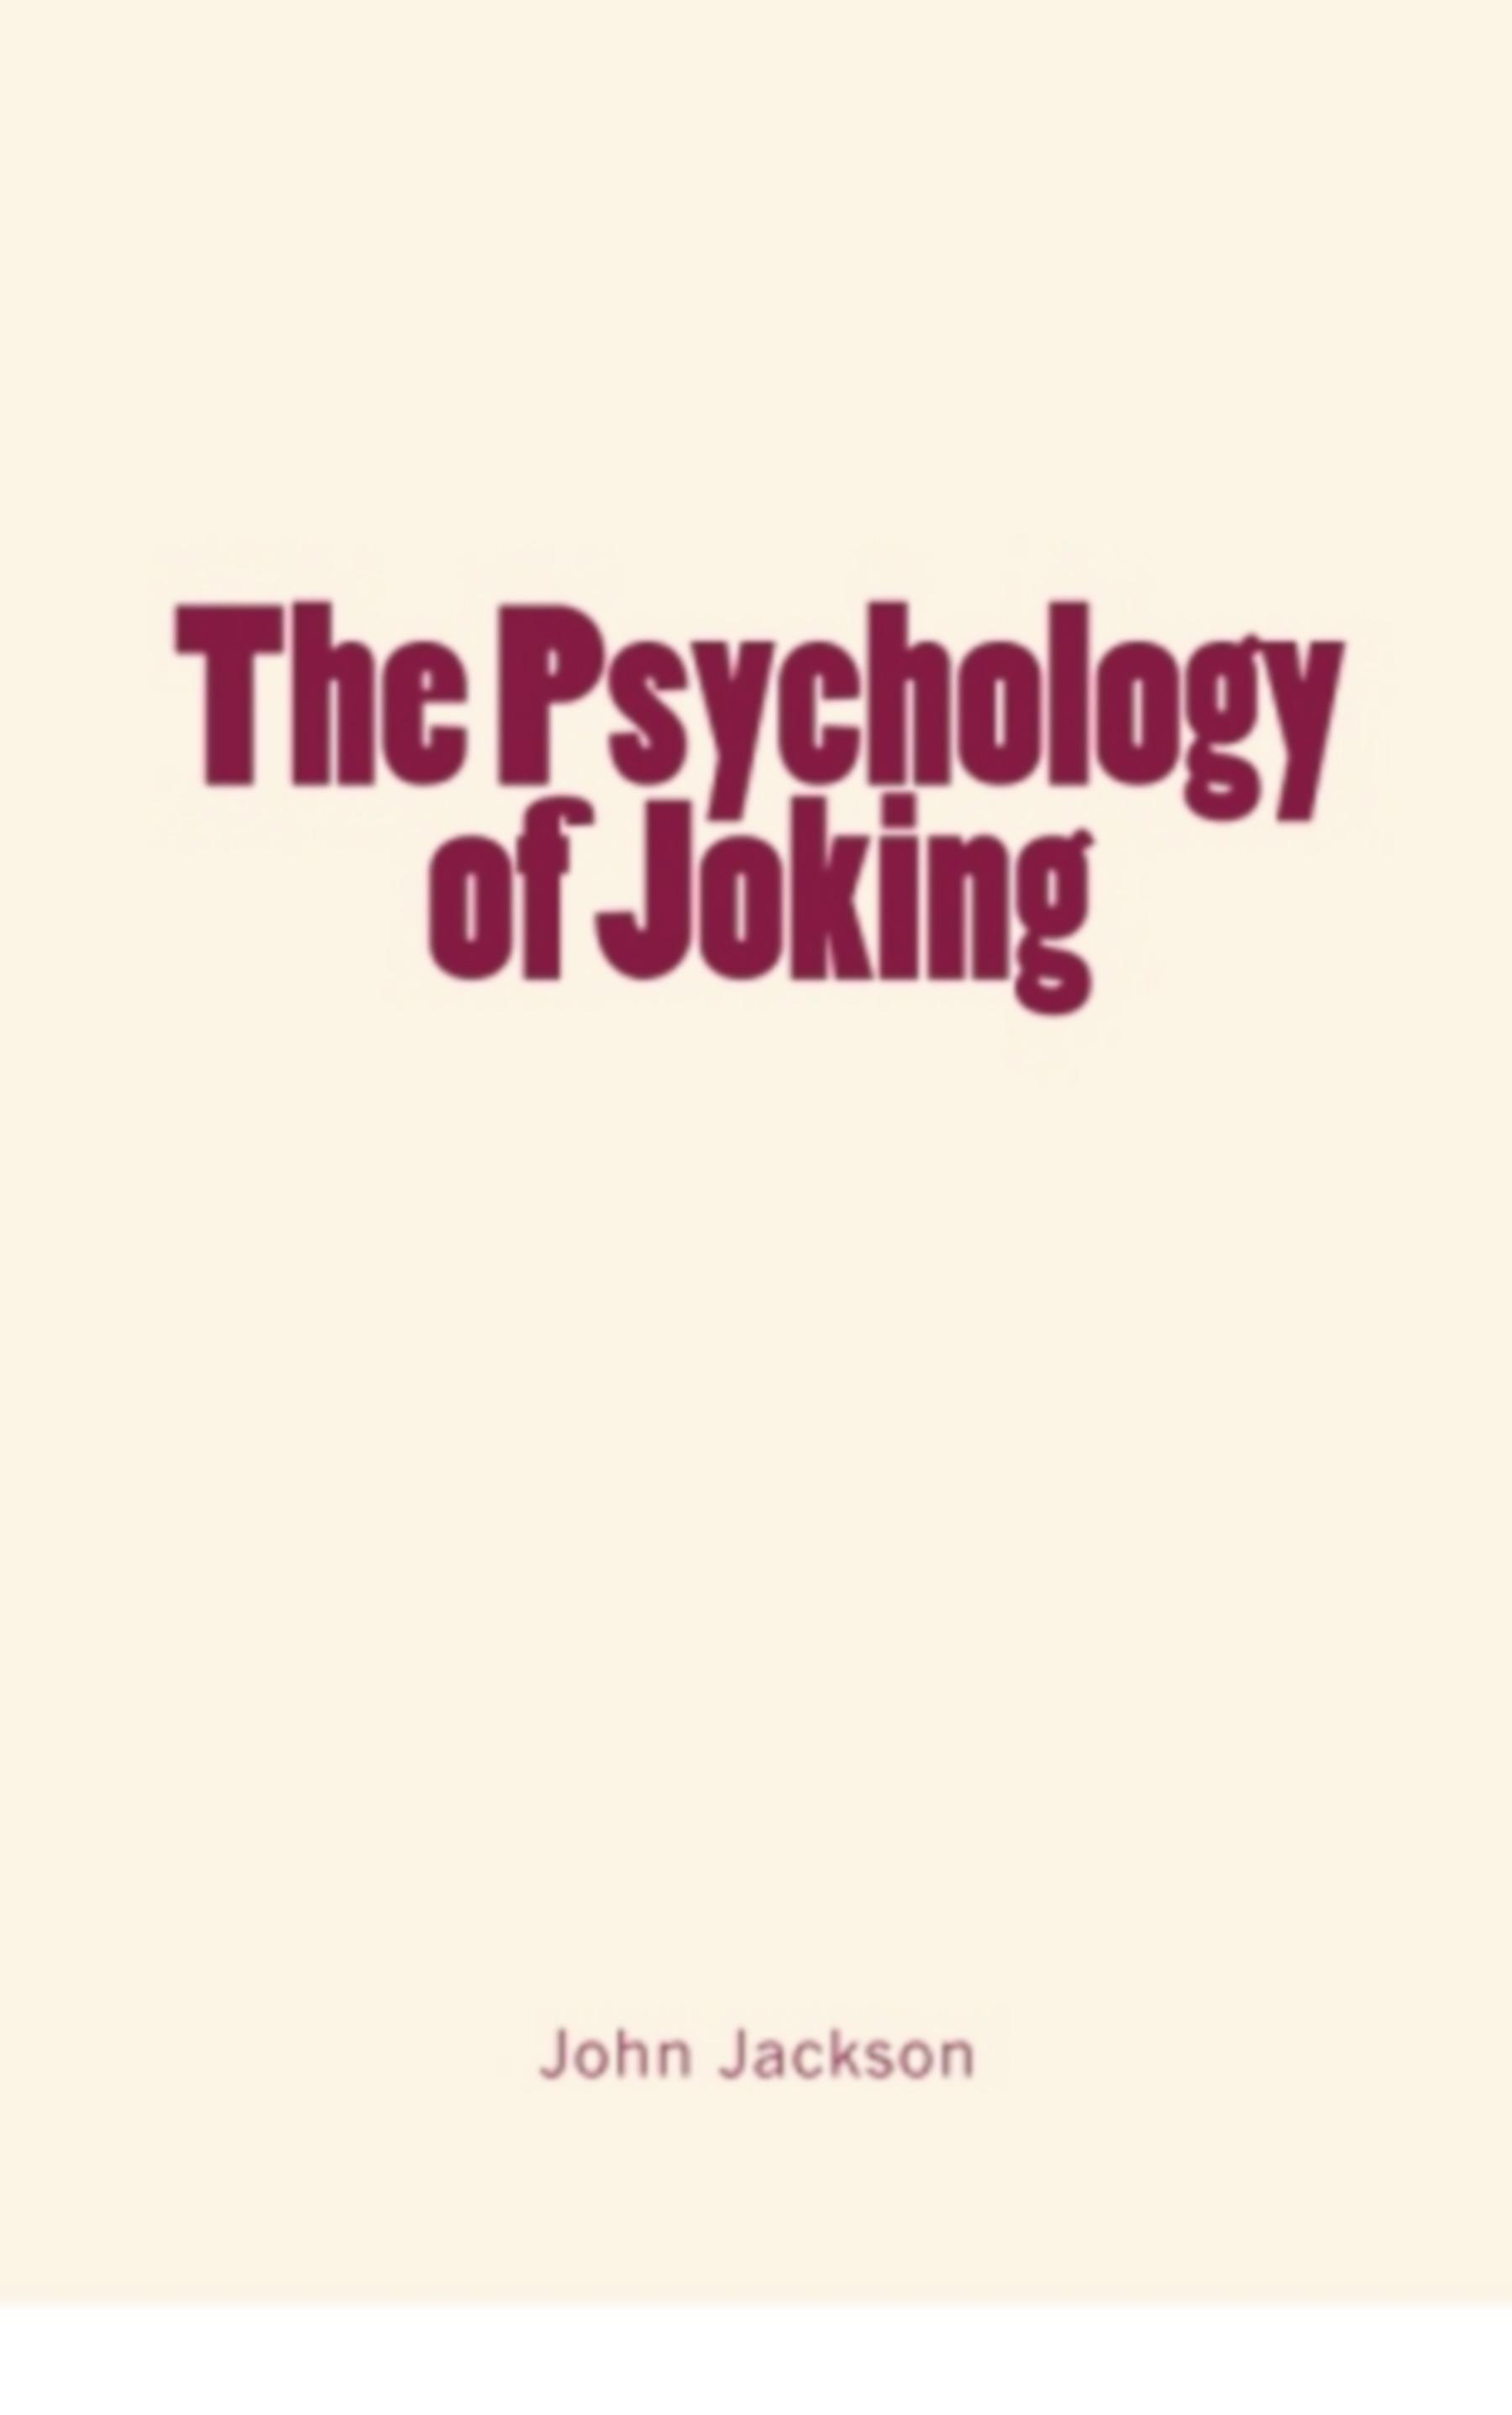 The Psychology of Joking